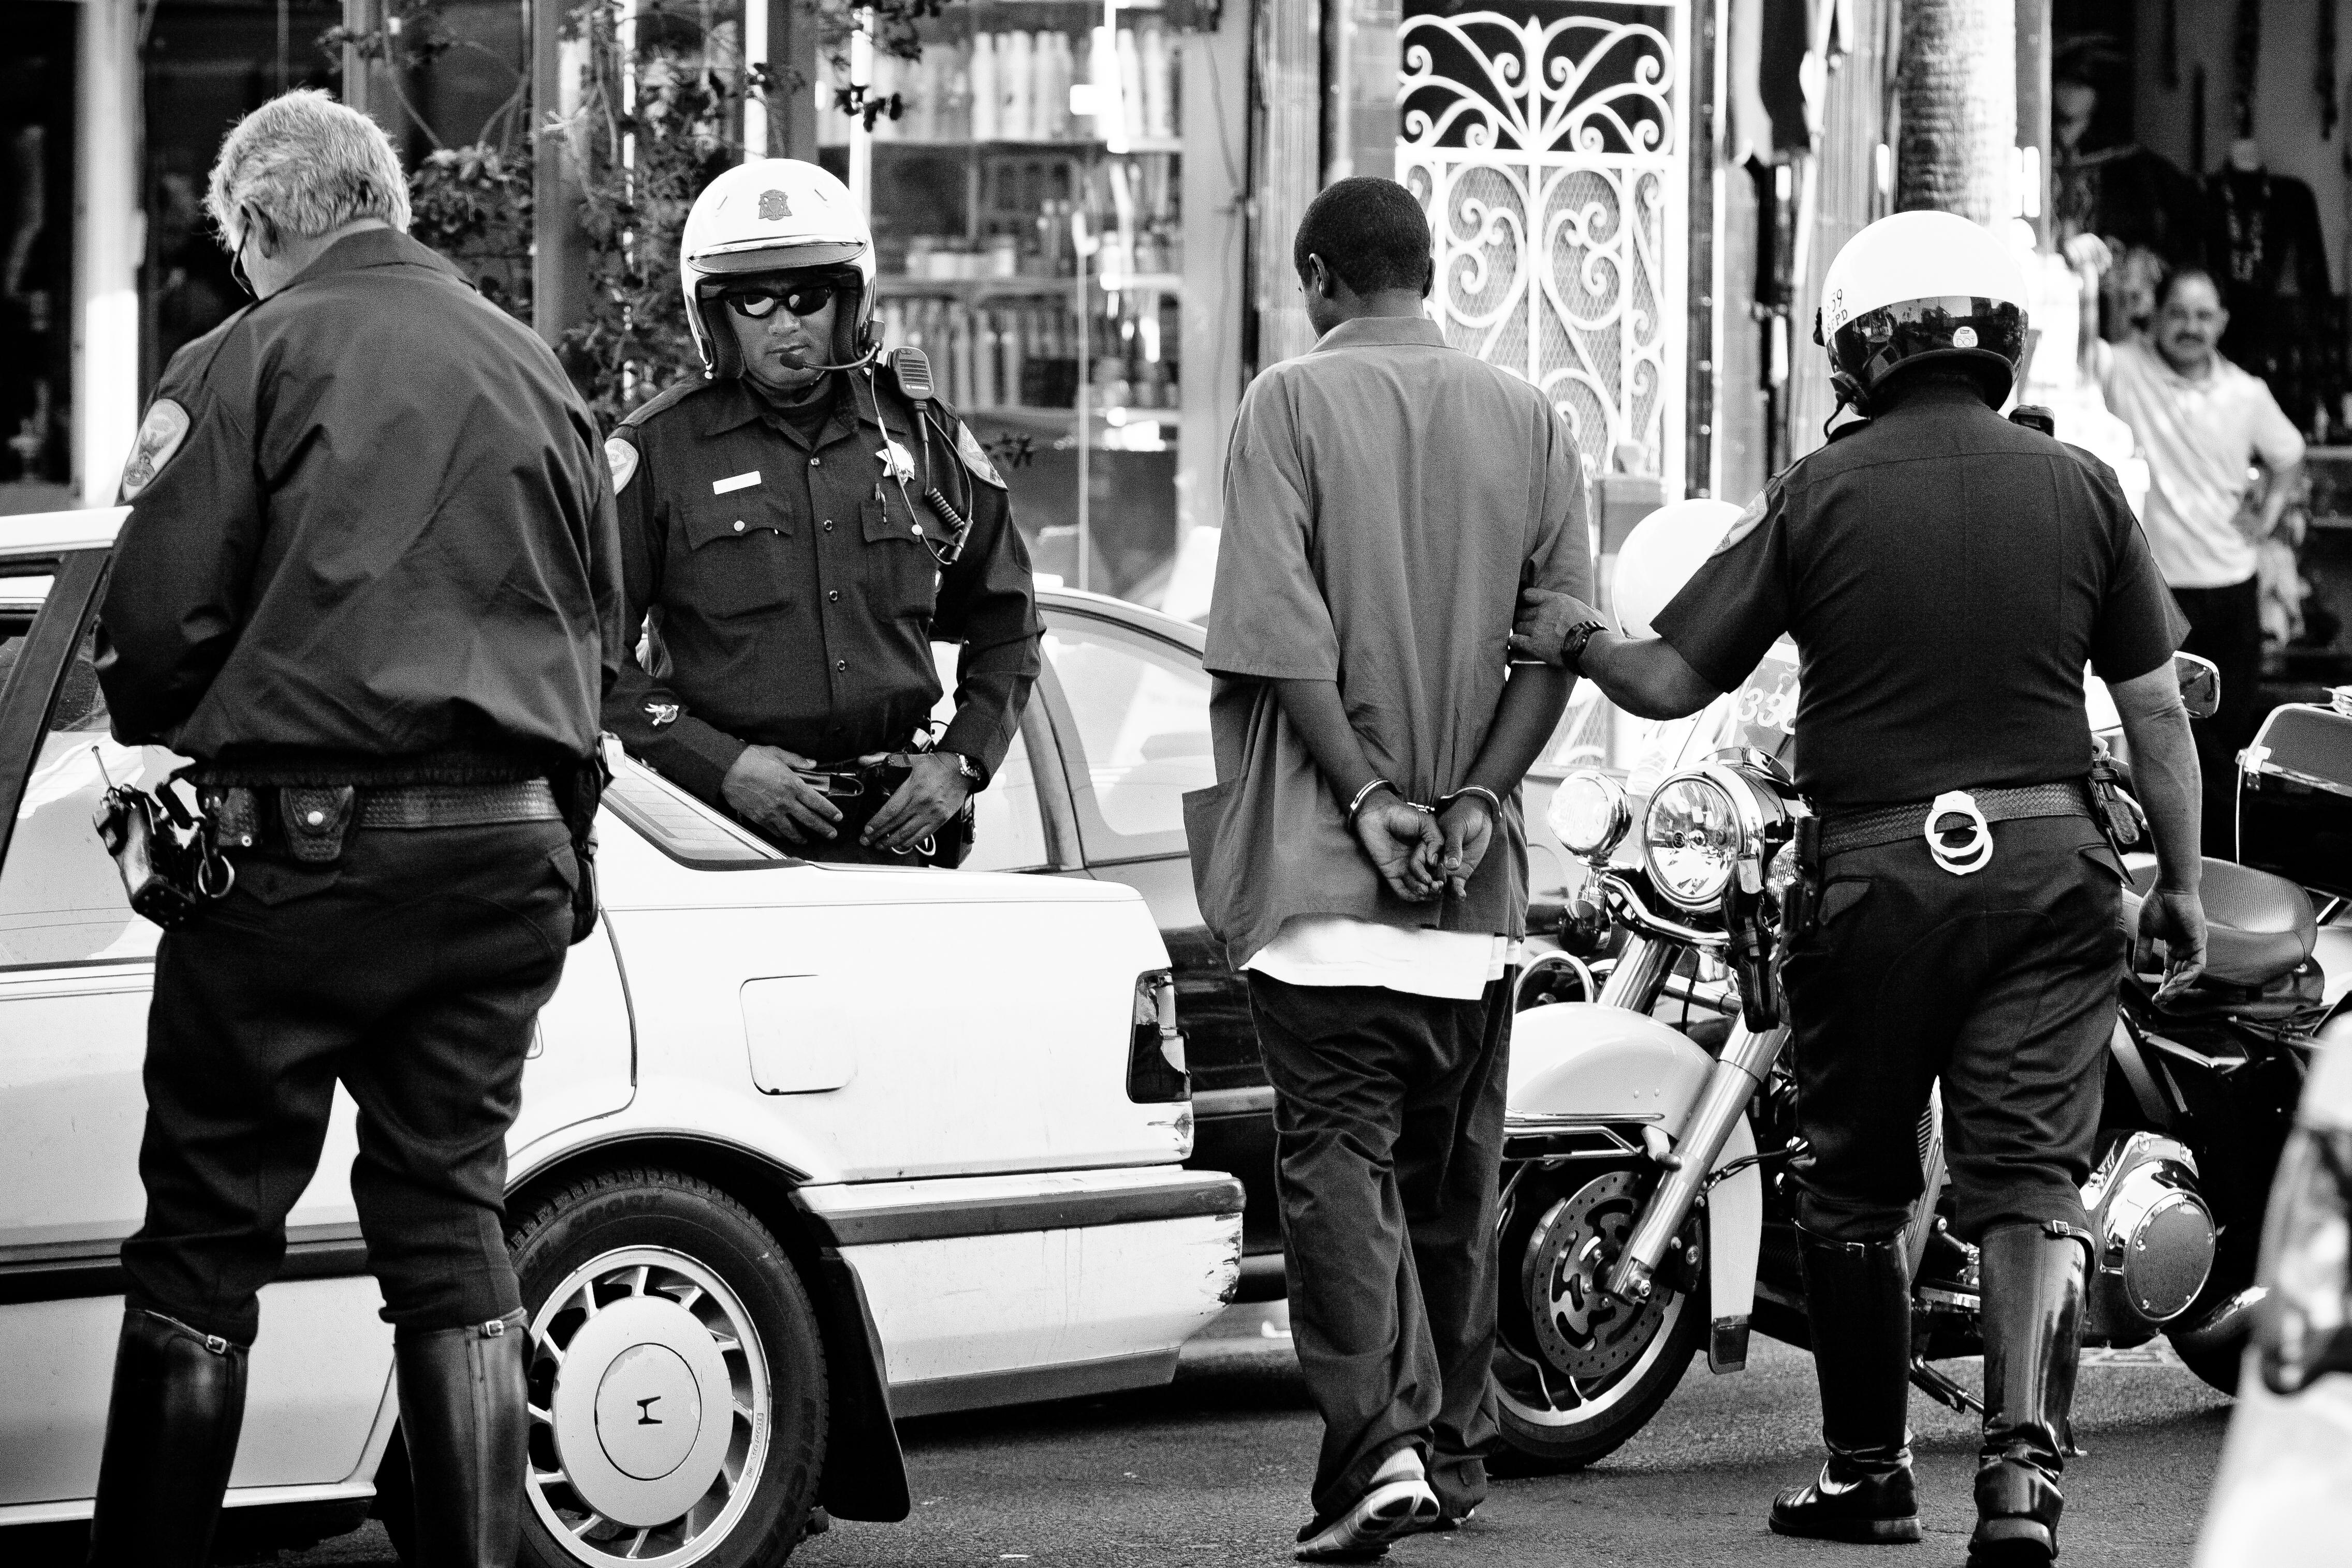 The White Politics of Anti-Black Racism